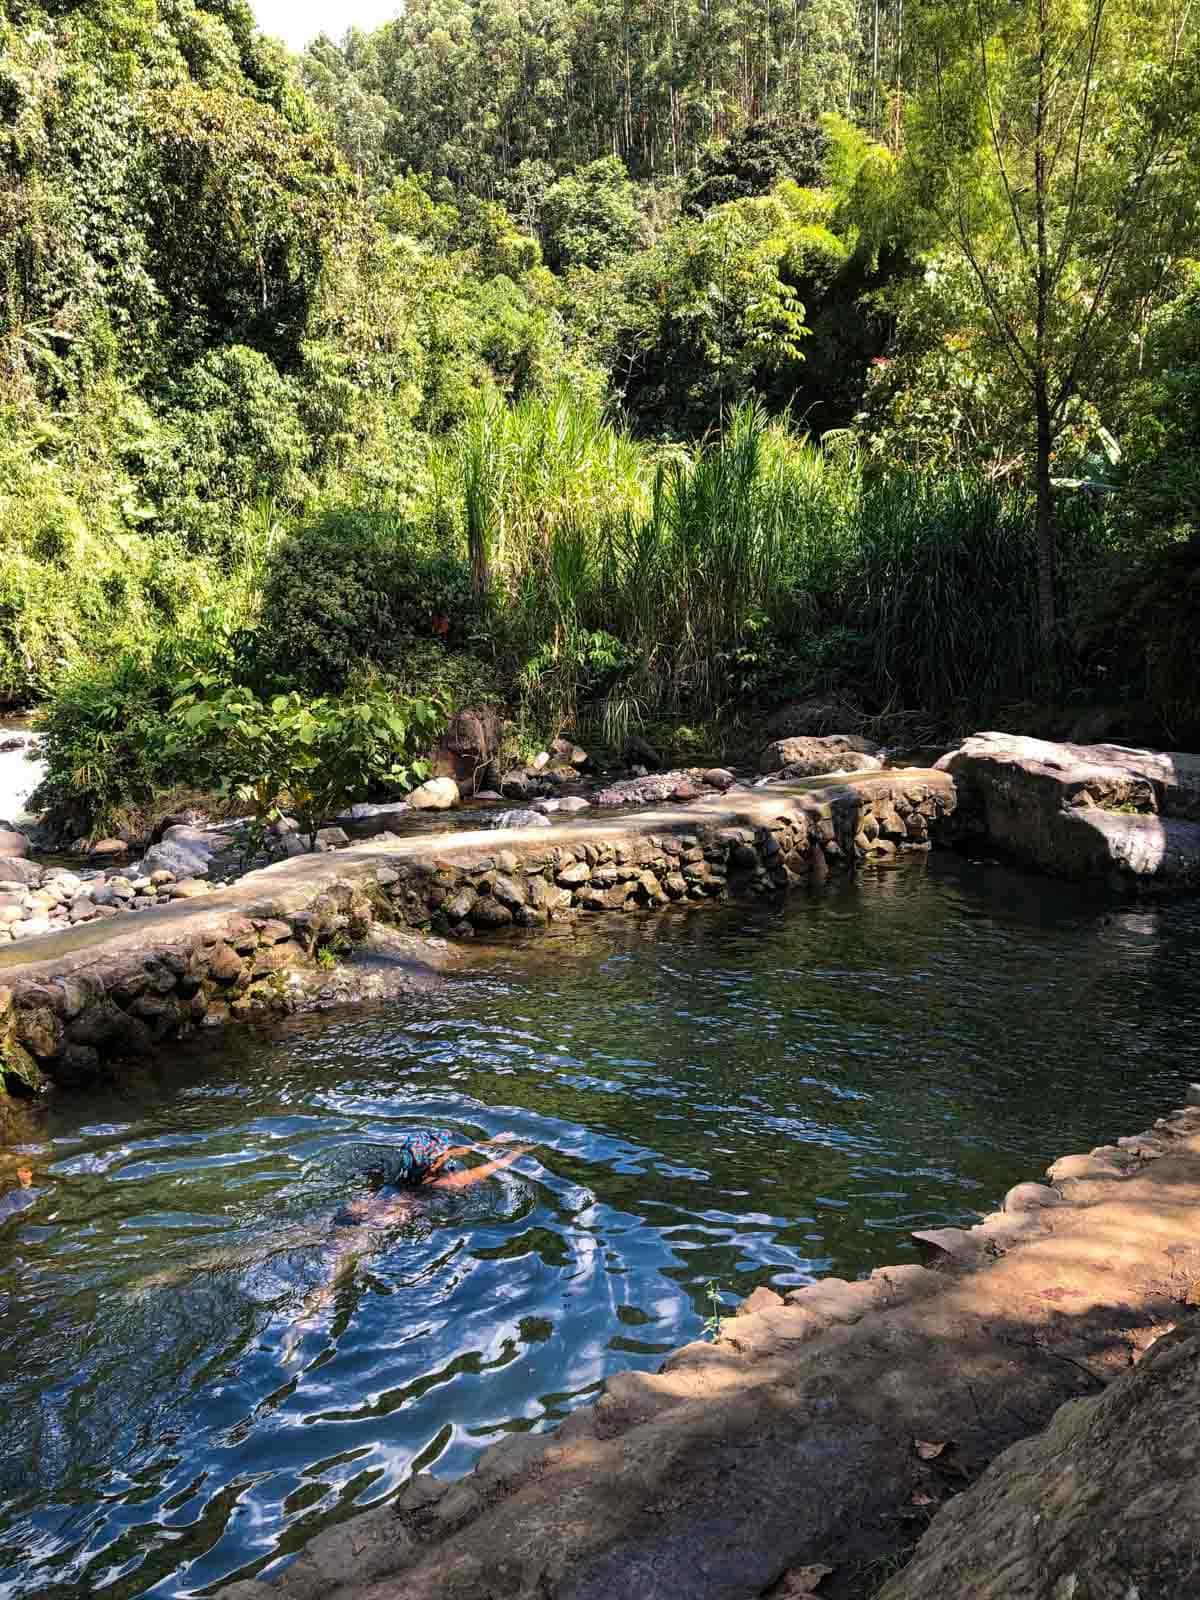 Locals swimming in Jardin, Colombia.